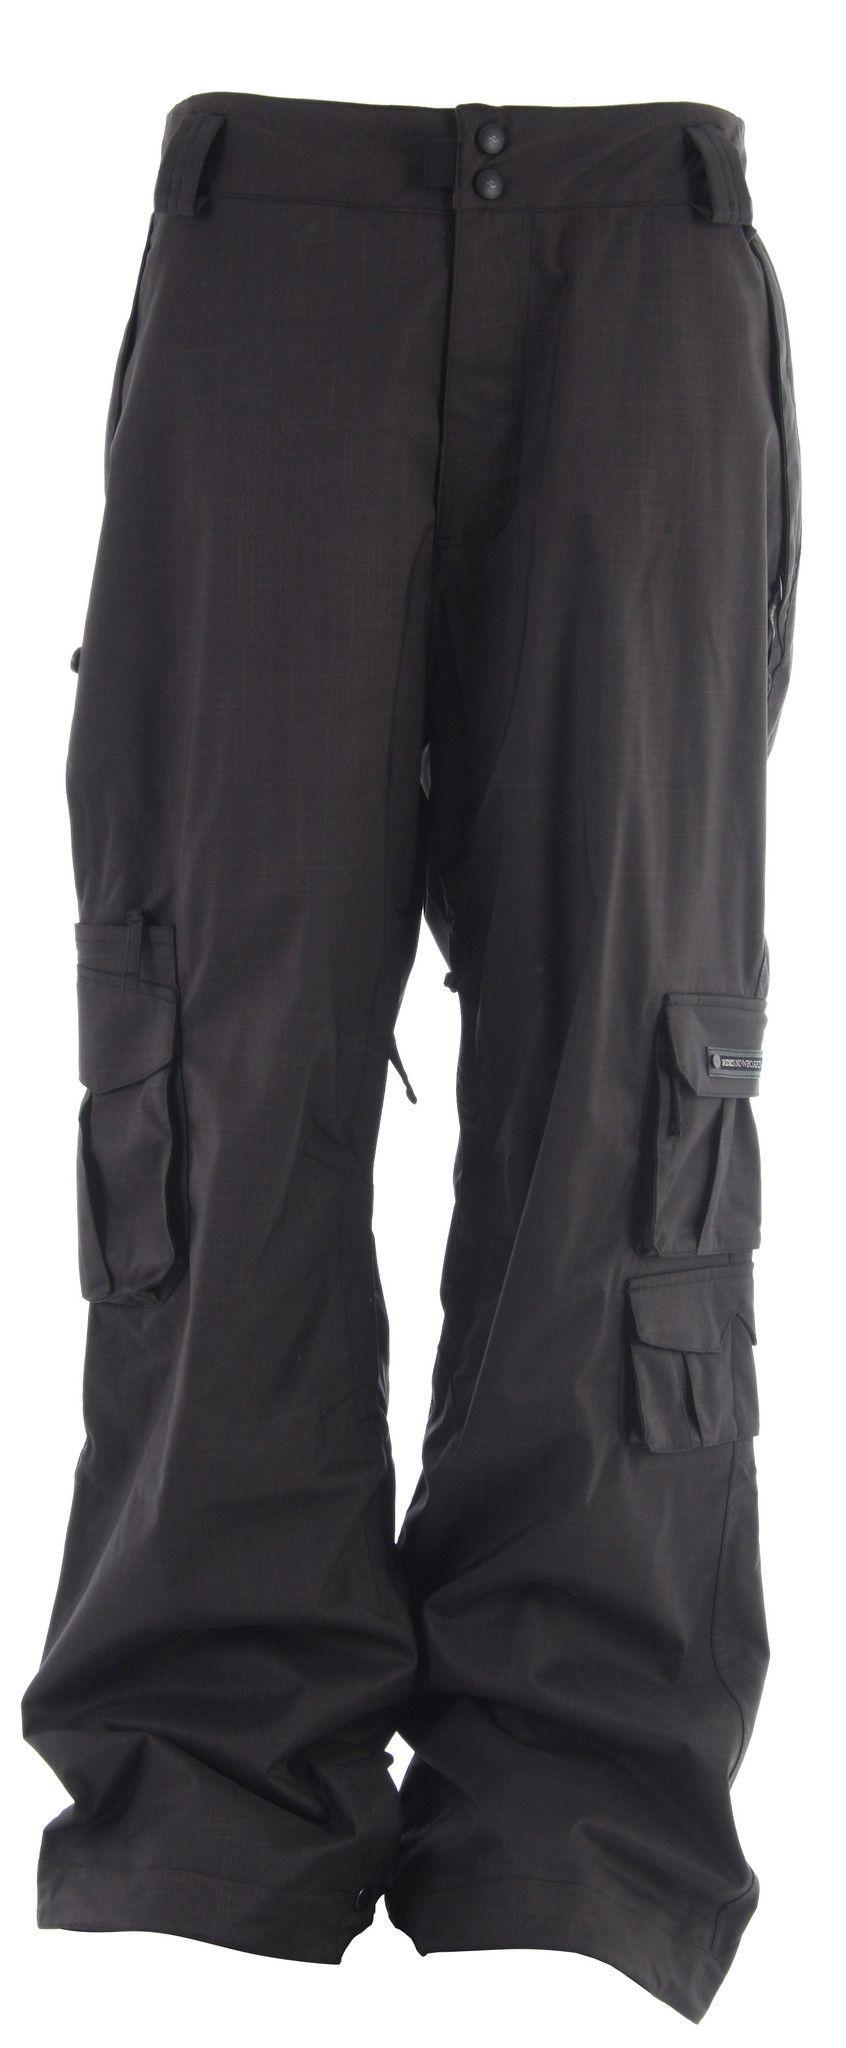 Ride Belltown Ski Snowboard Pants Black Mens